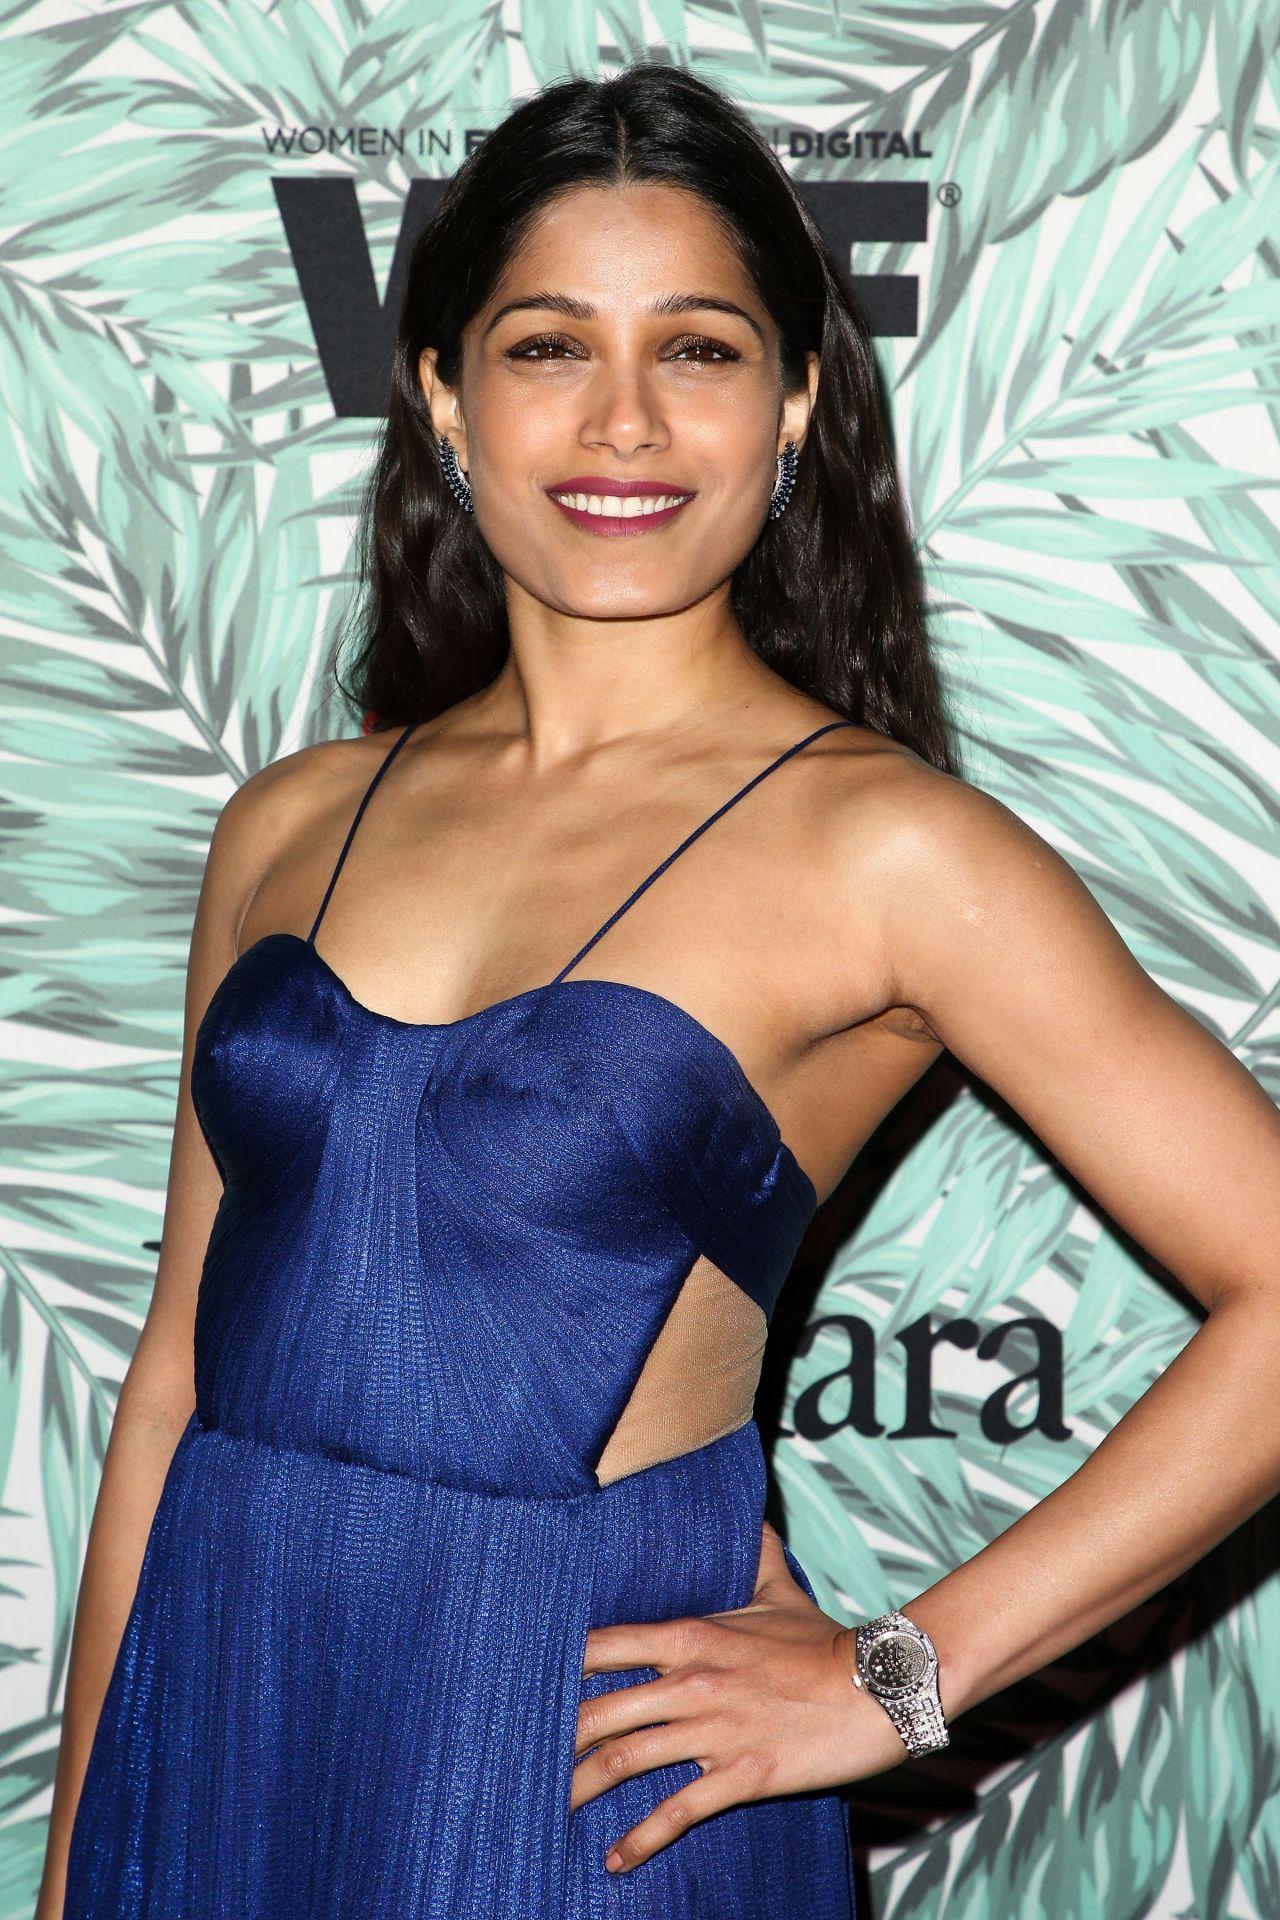 Freida Pinto - Woman in Film Cocktail Party in Los Angeles ... Freida Pinto